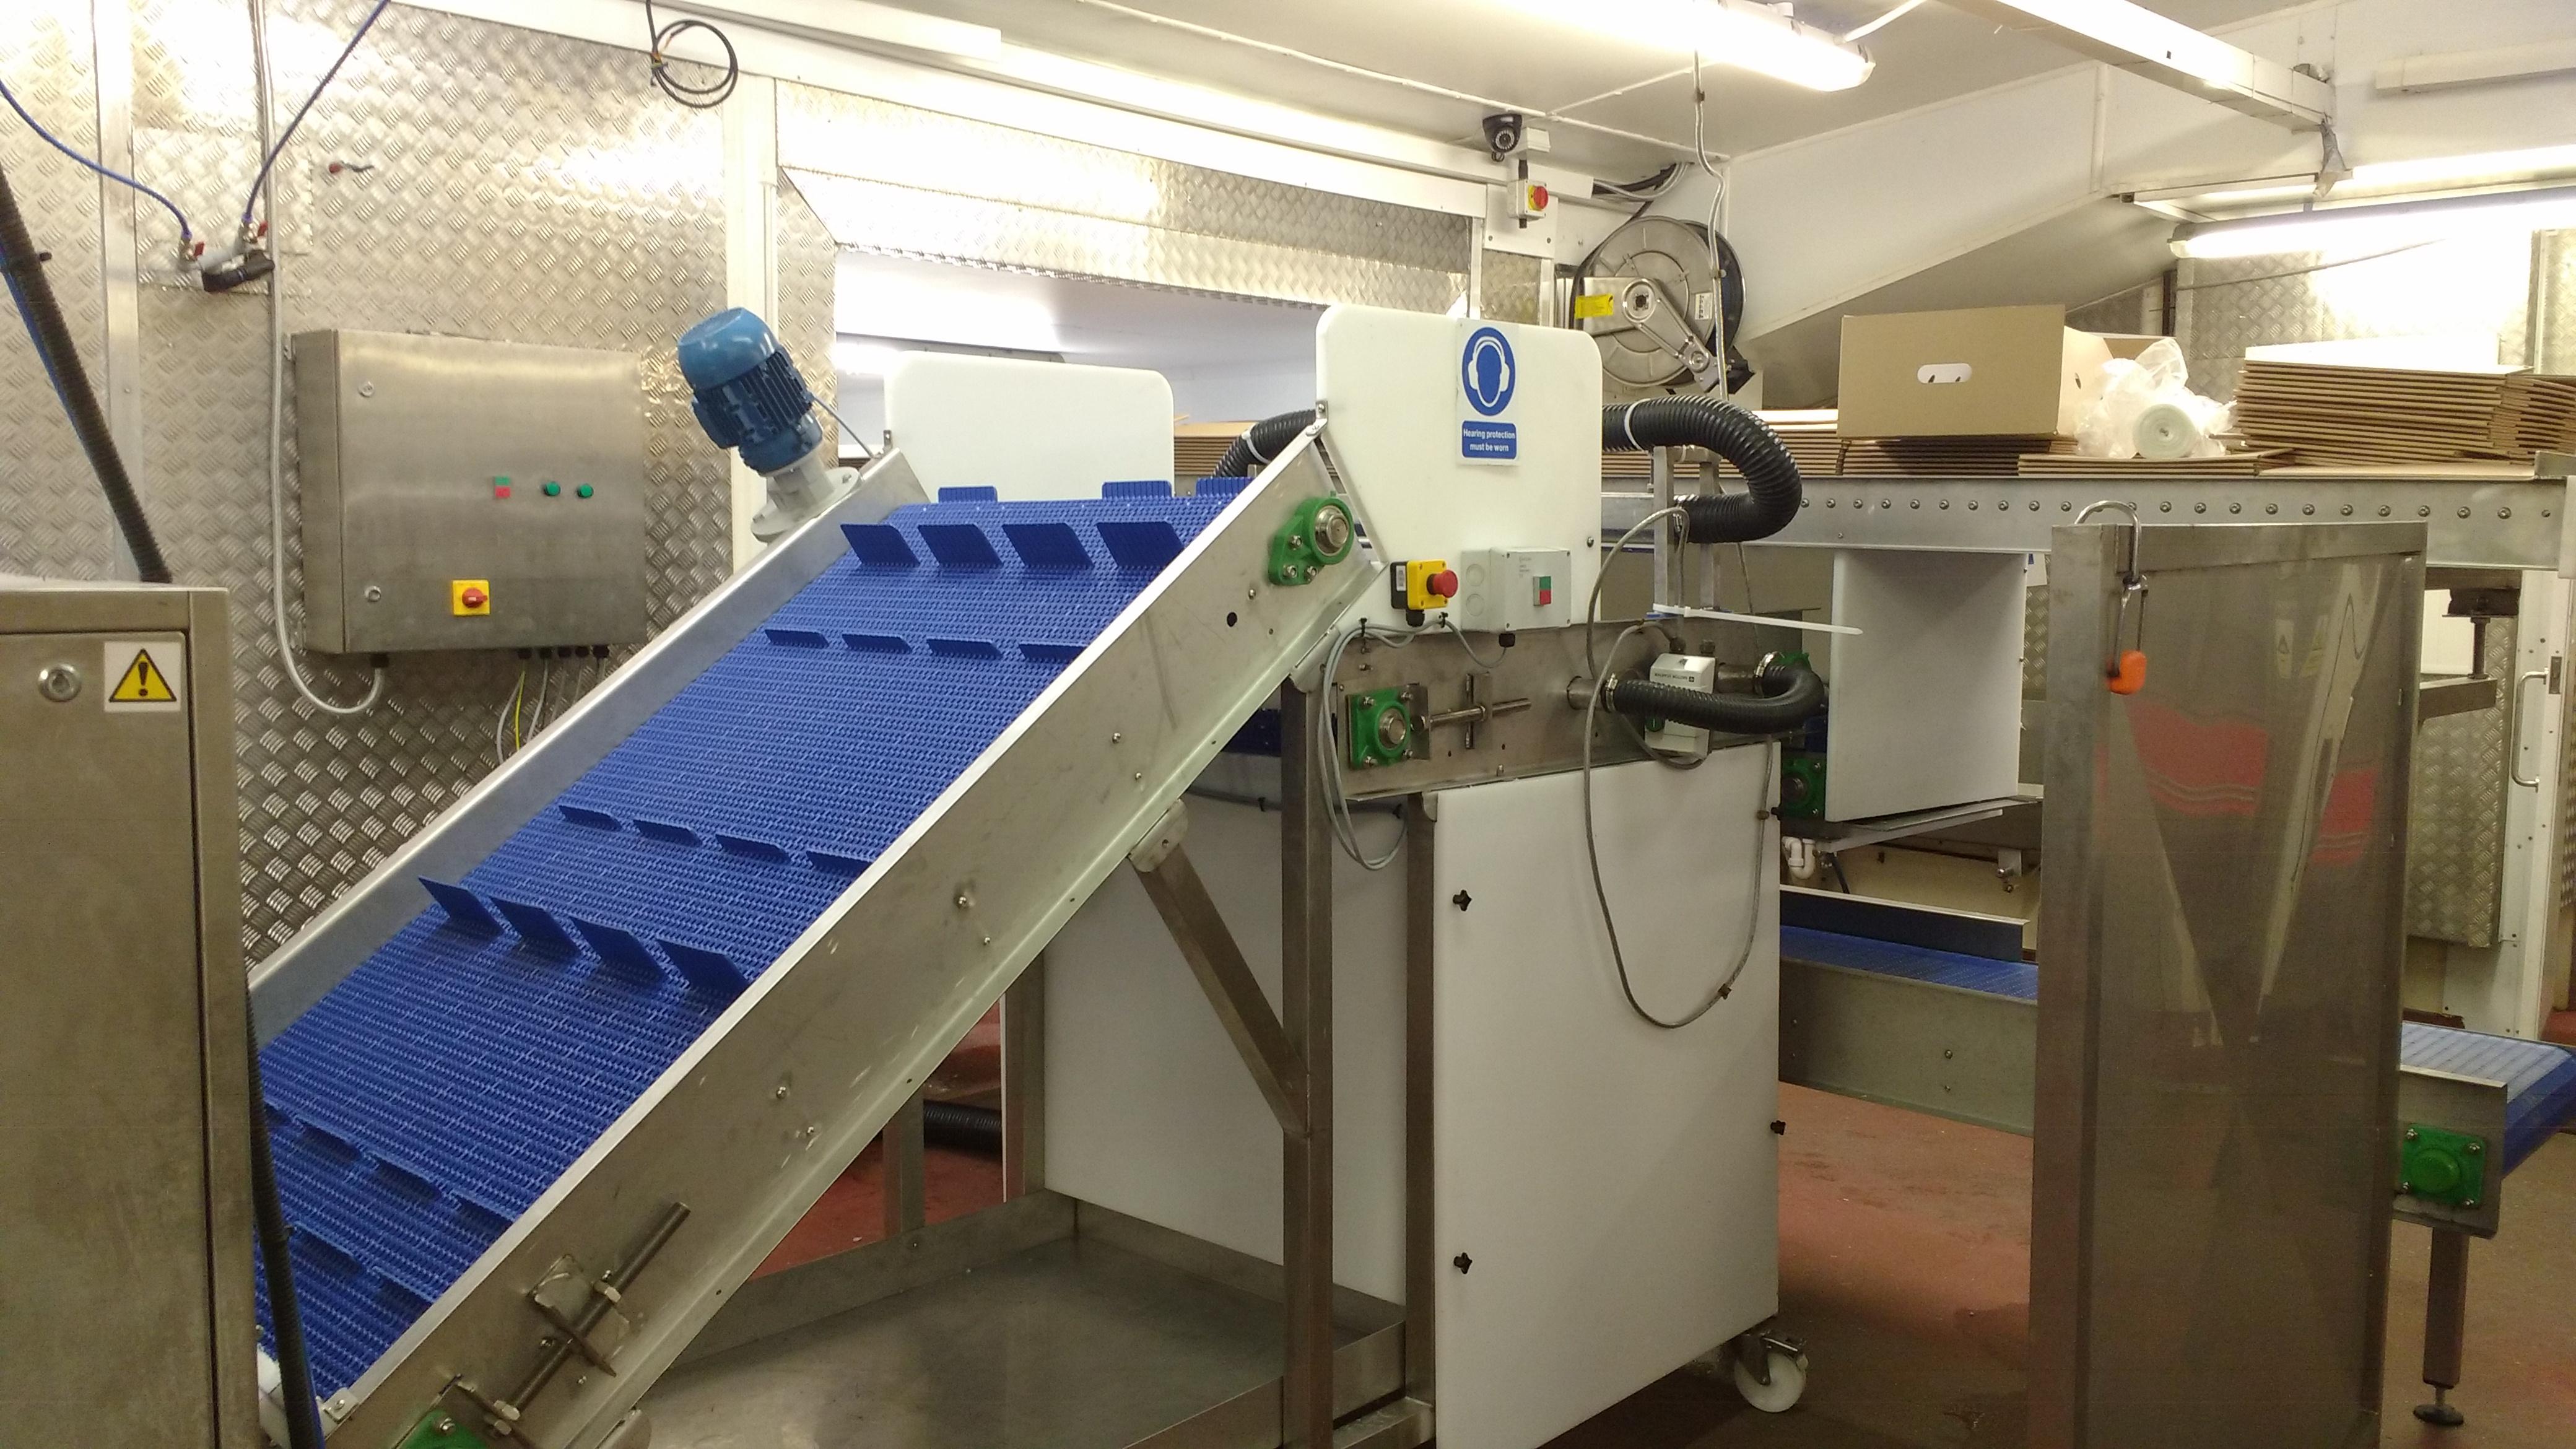 Drying conveyor